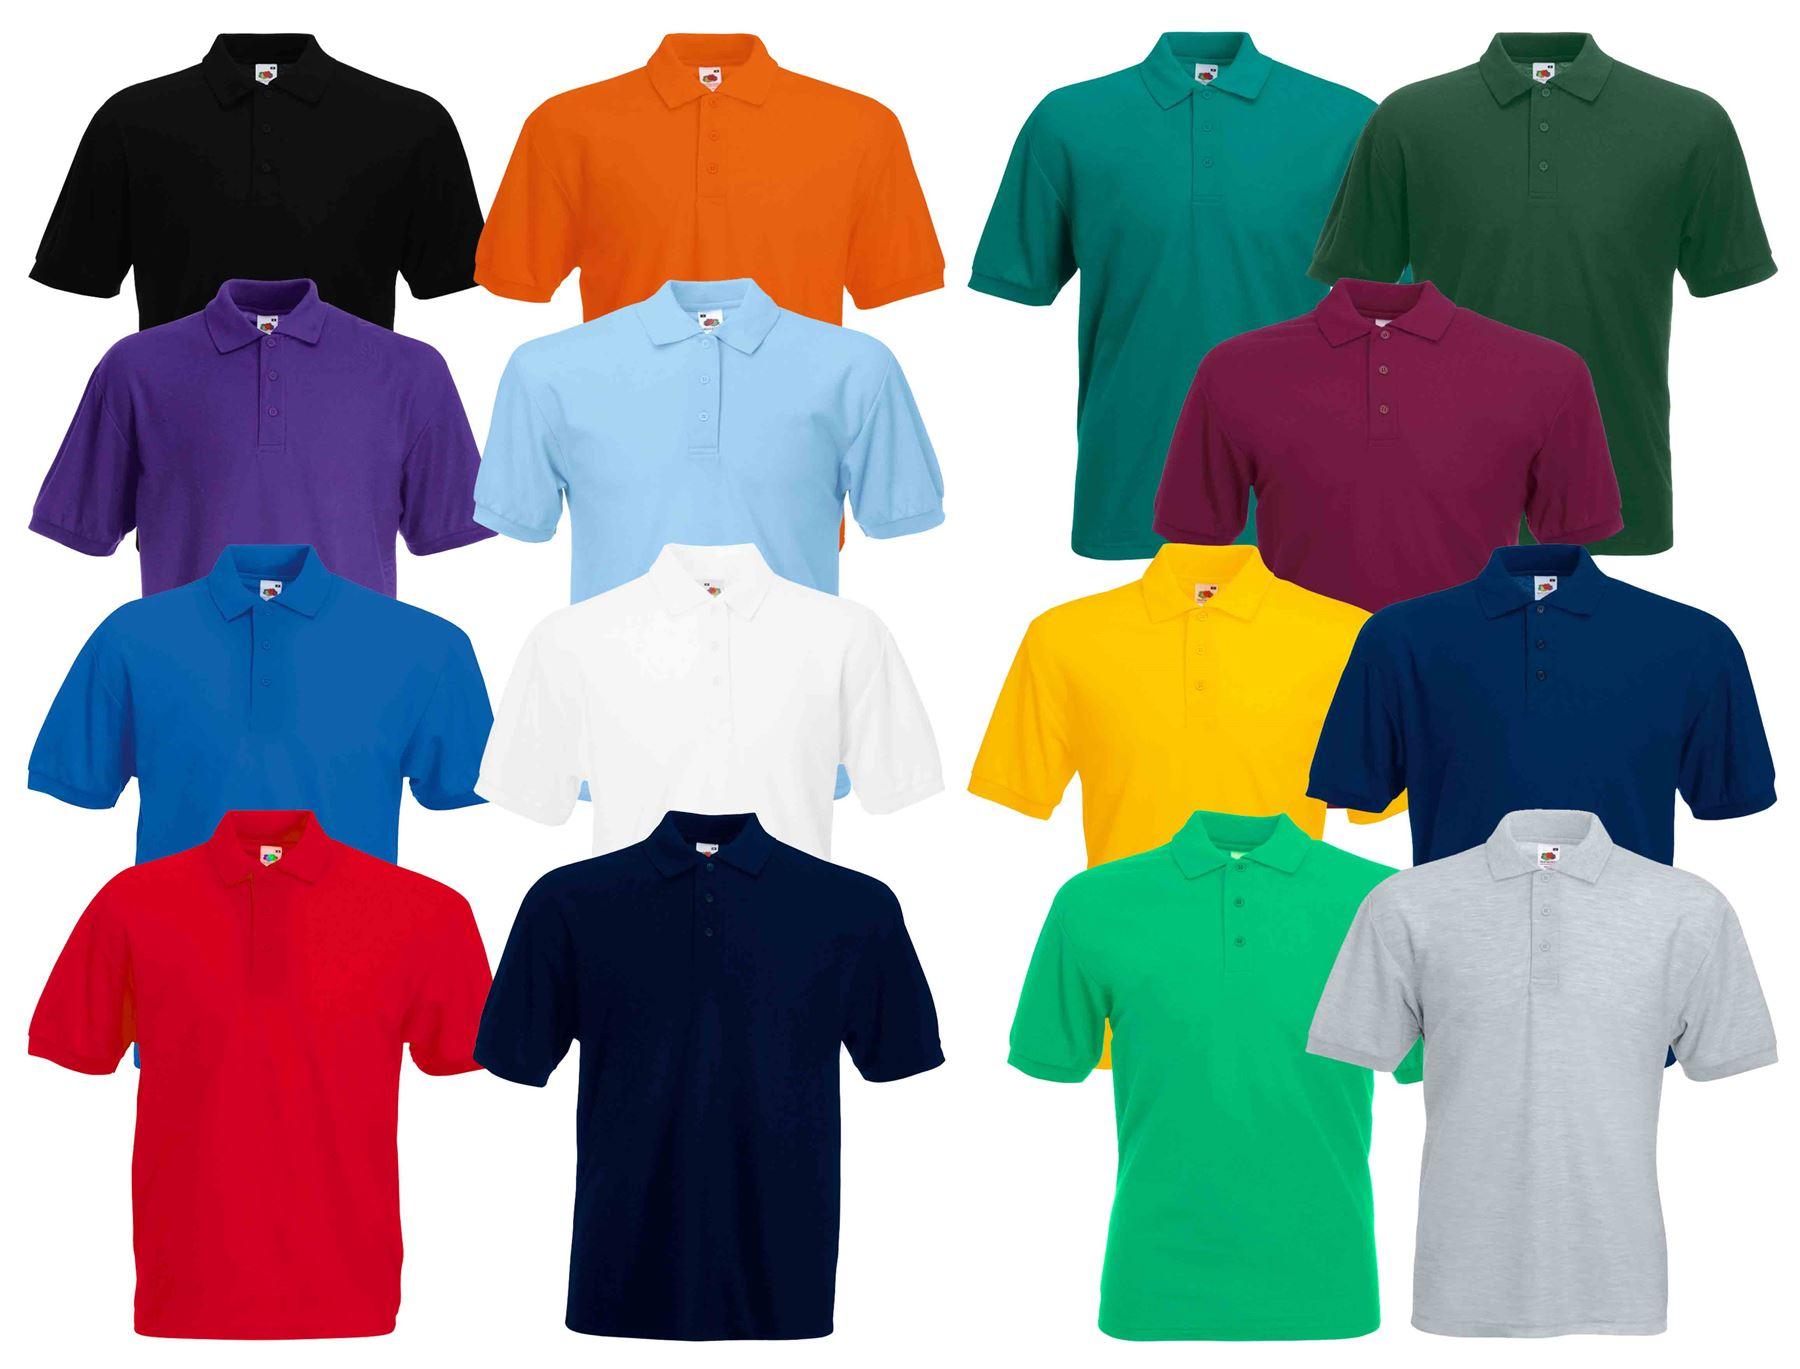 0dacfc43 Details about Fruit of the Loom Plain Cotton Mens Polo Shirts T-Shirt Short  Sleeve Tshirt